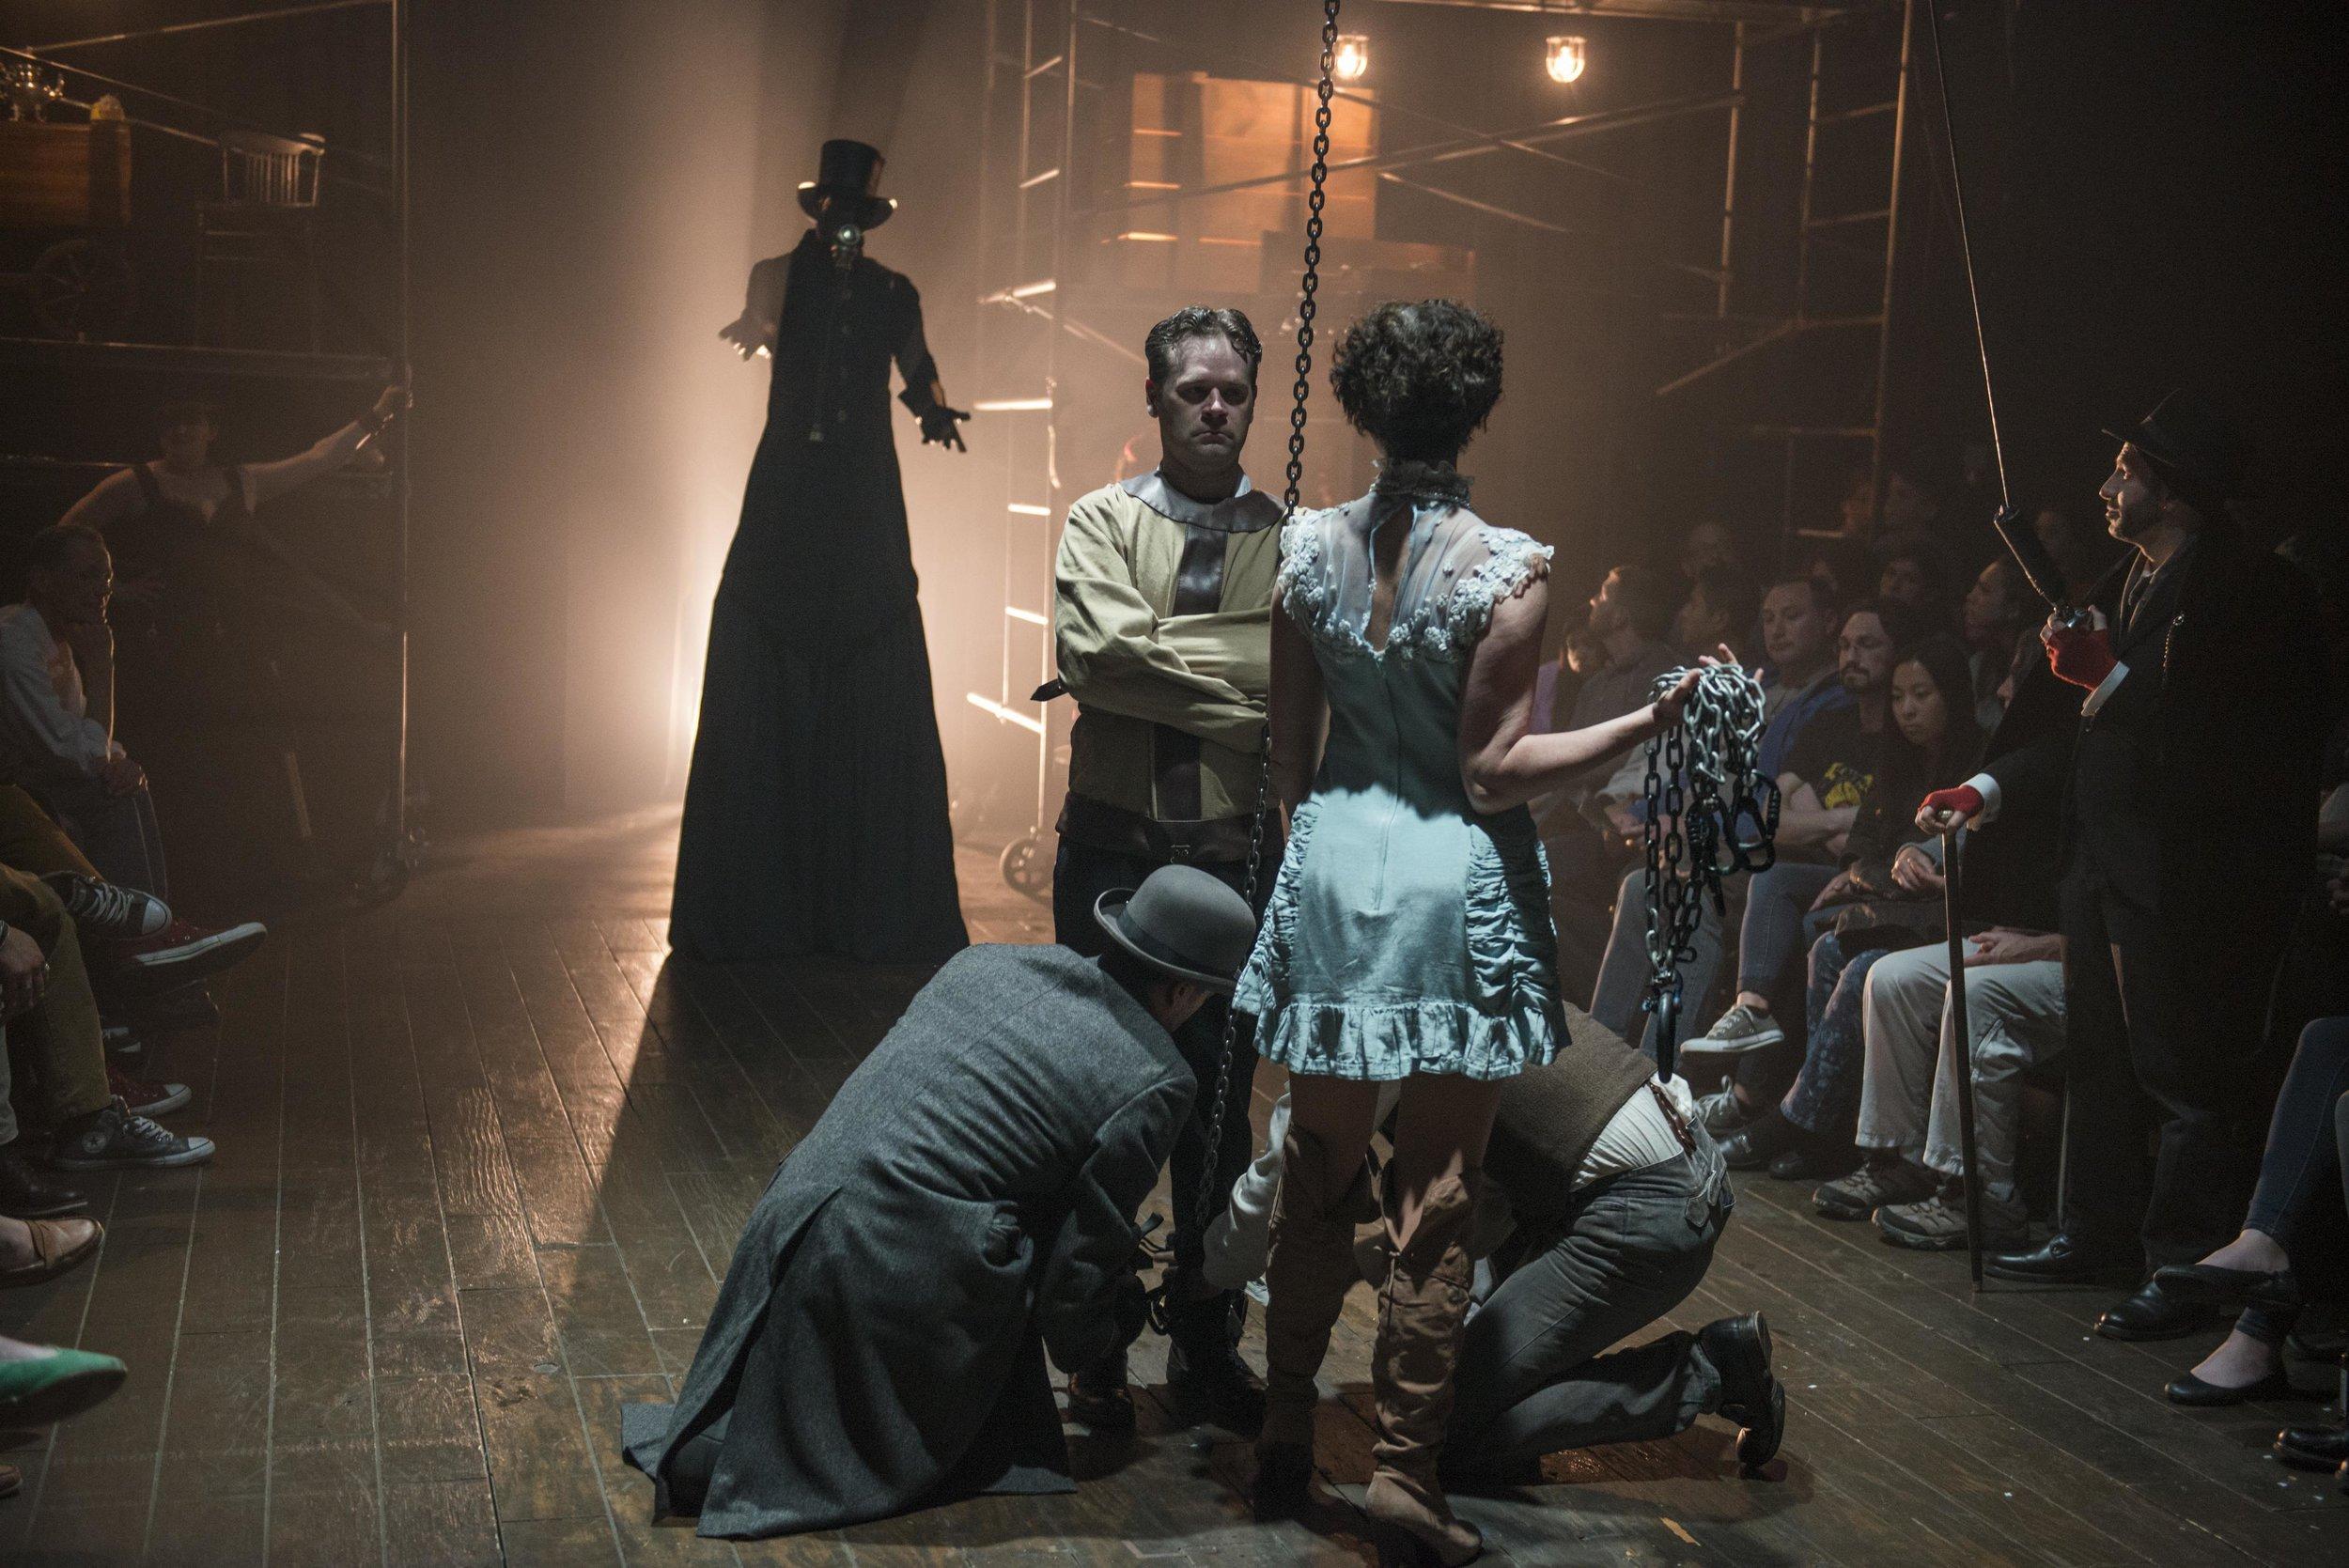 Houdini2016_012_HouseTheatre_DeathcomesforHoudini2_Watkins and Ensemble_photobyMichaelBrosilow.jpg